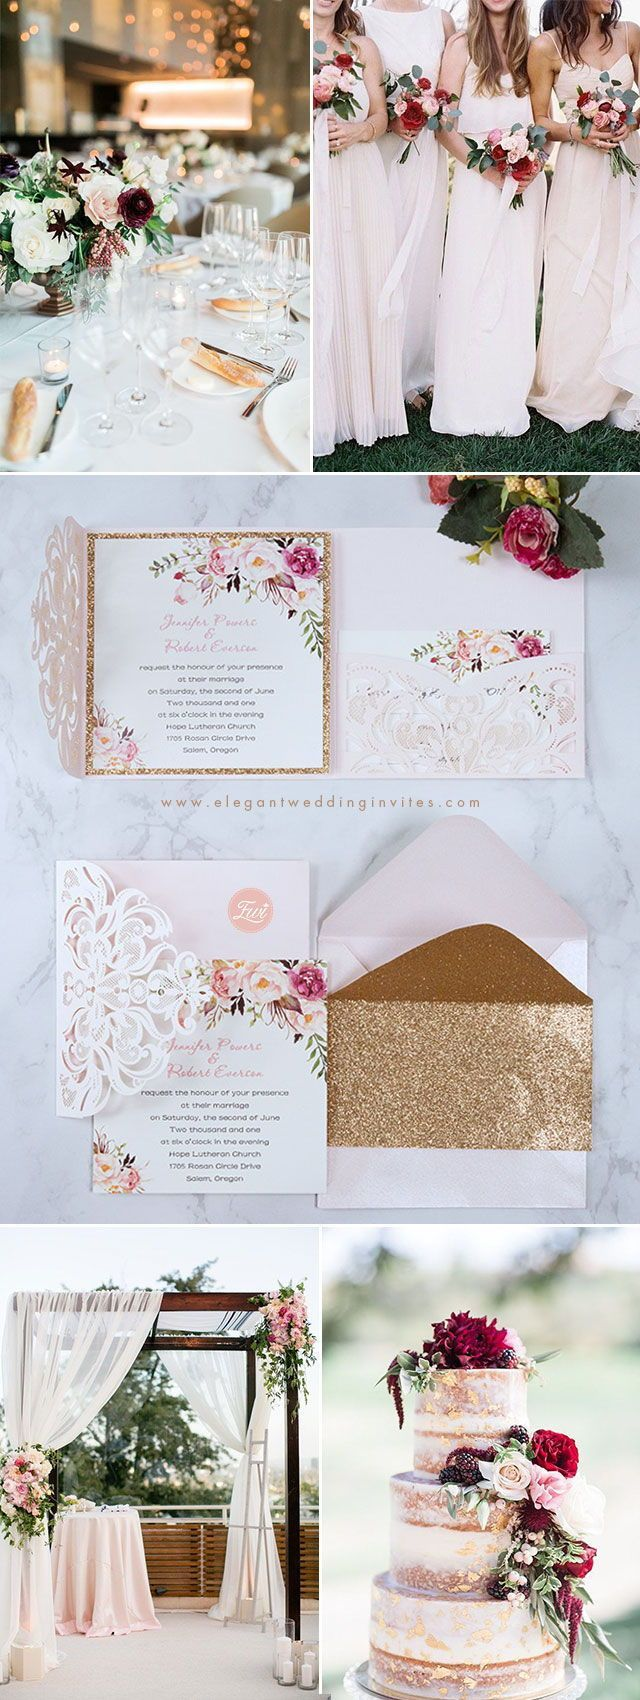 pocket wedding invitation templates%0A Fancy Blush Pink and Gold Floral Laser Cut Pocket Wedding Invitations  EWWS